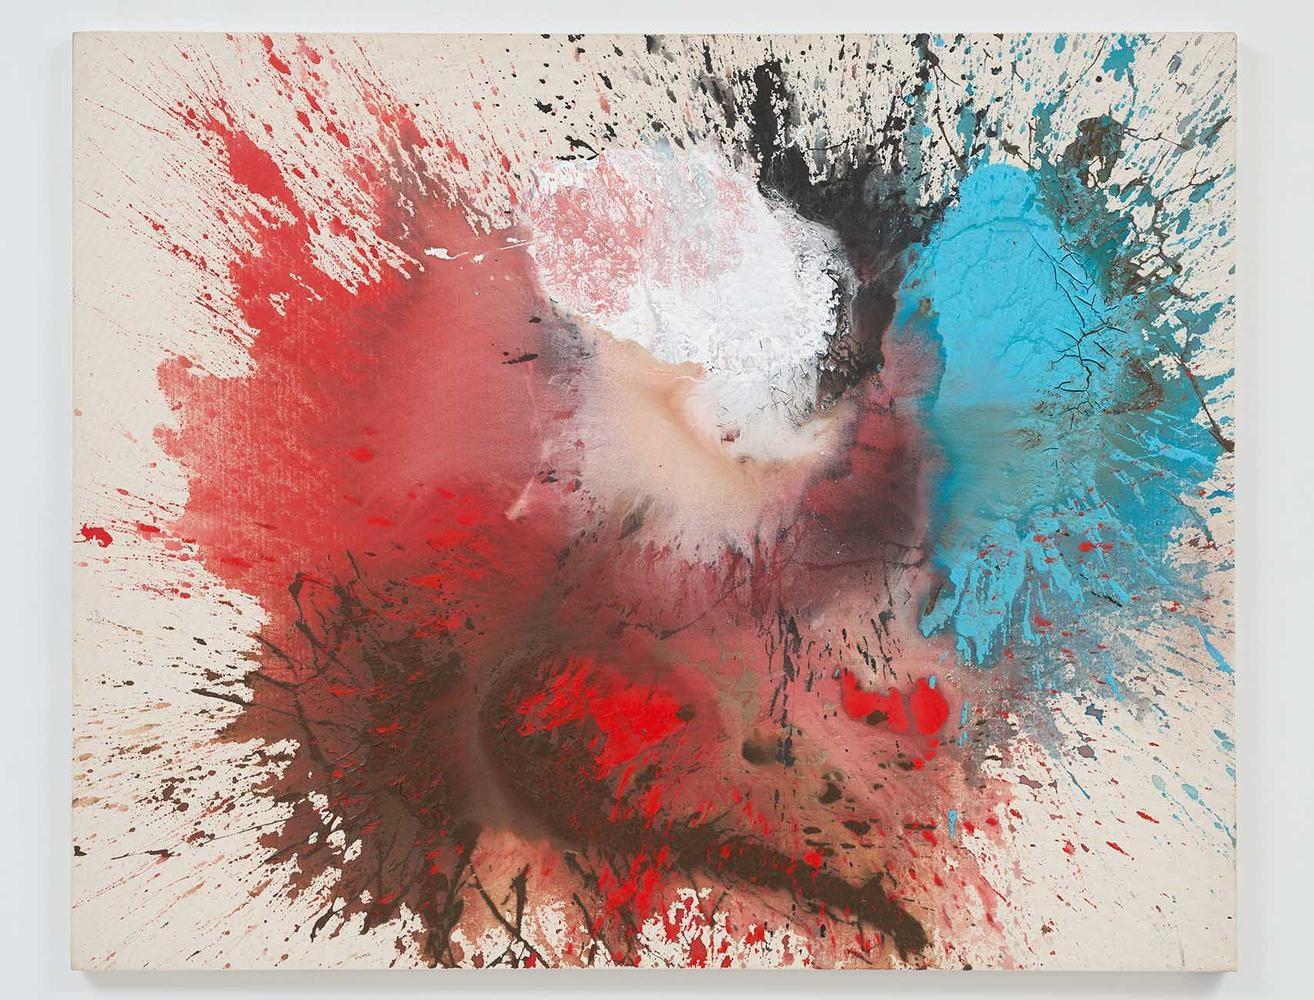 Ed Clark  Untitled  2005  acrylic on canvas  53 1/4 x 66 inches (135.3 x 167.6 cm)